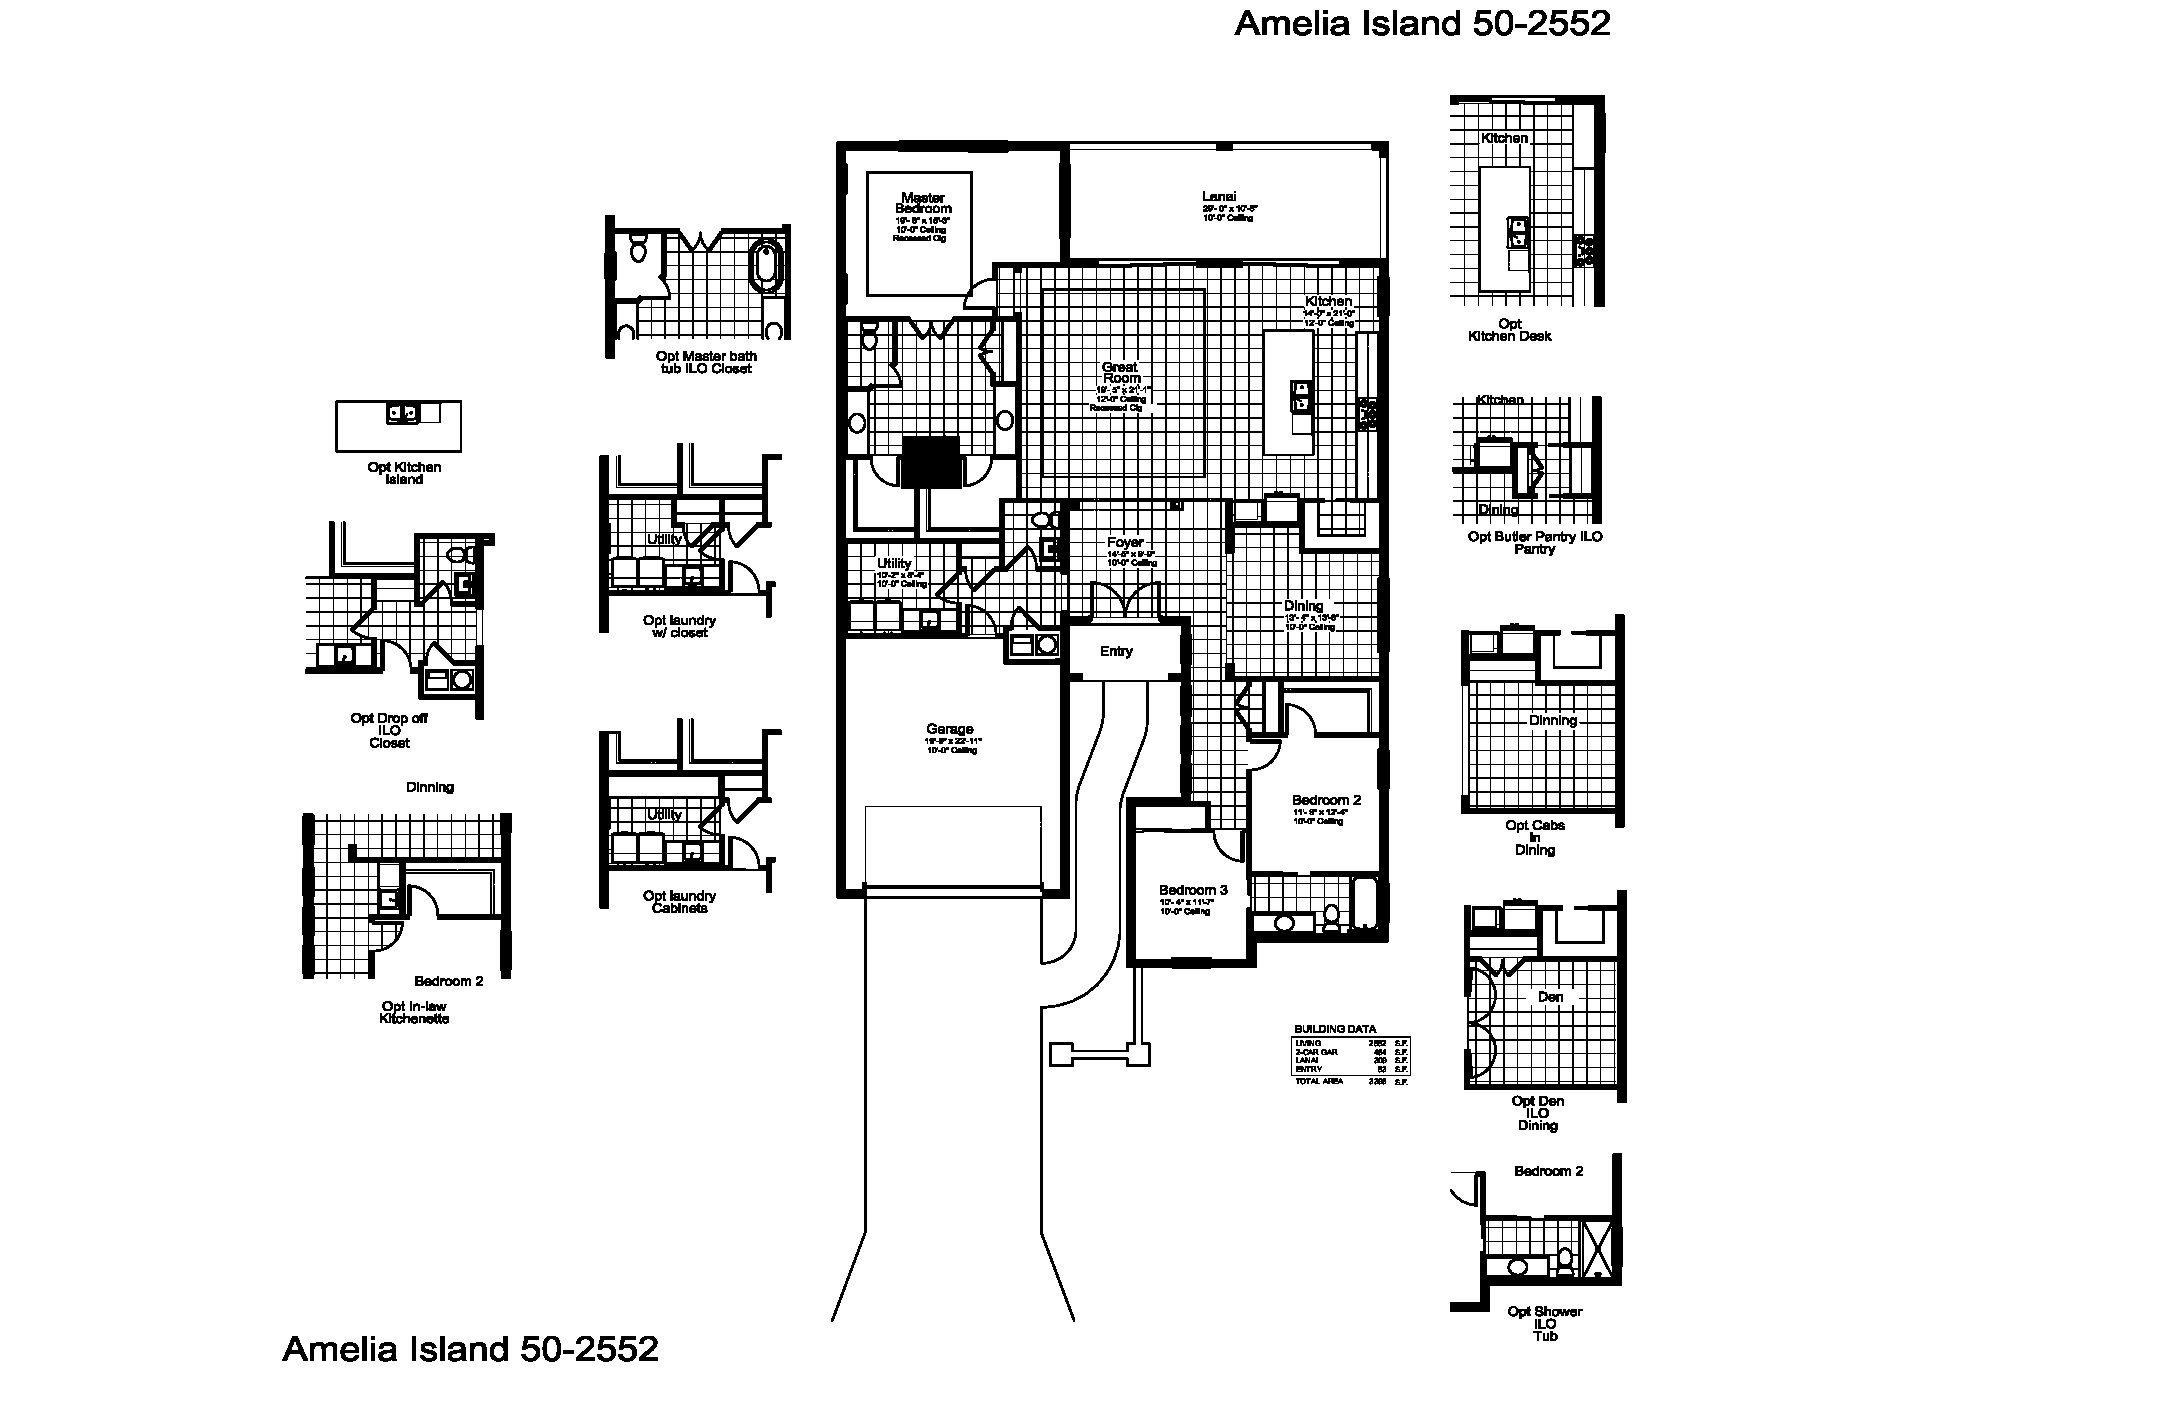 (Contact agent for address) Amelia Island